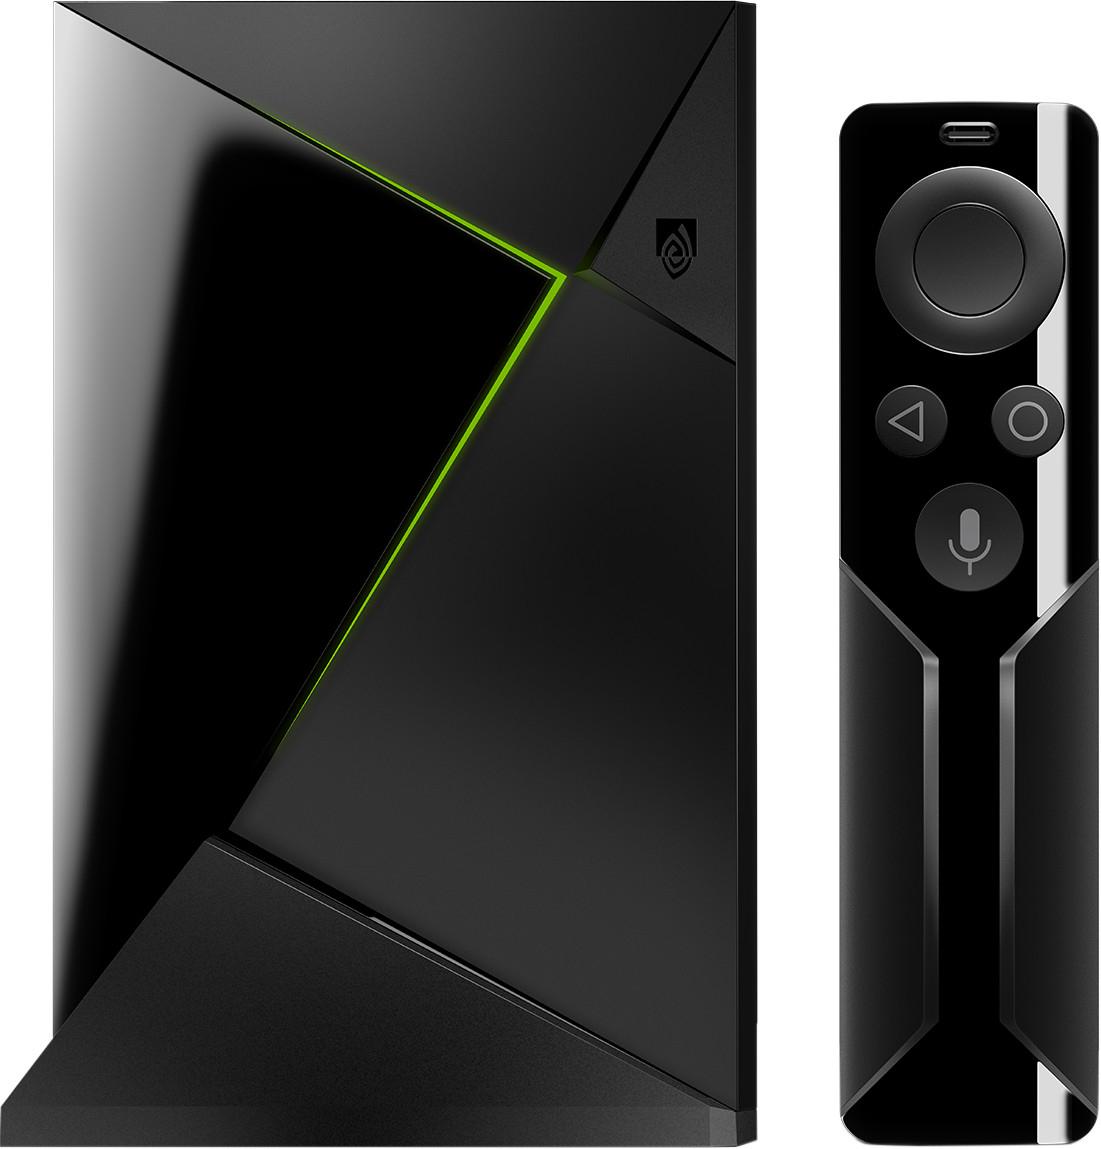 Nvidia Shield 16GB (2017) inclusief afstandsbediening nu voor €159 bij Coolblue